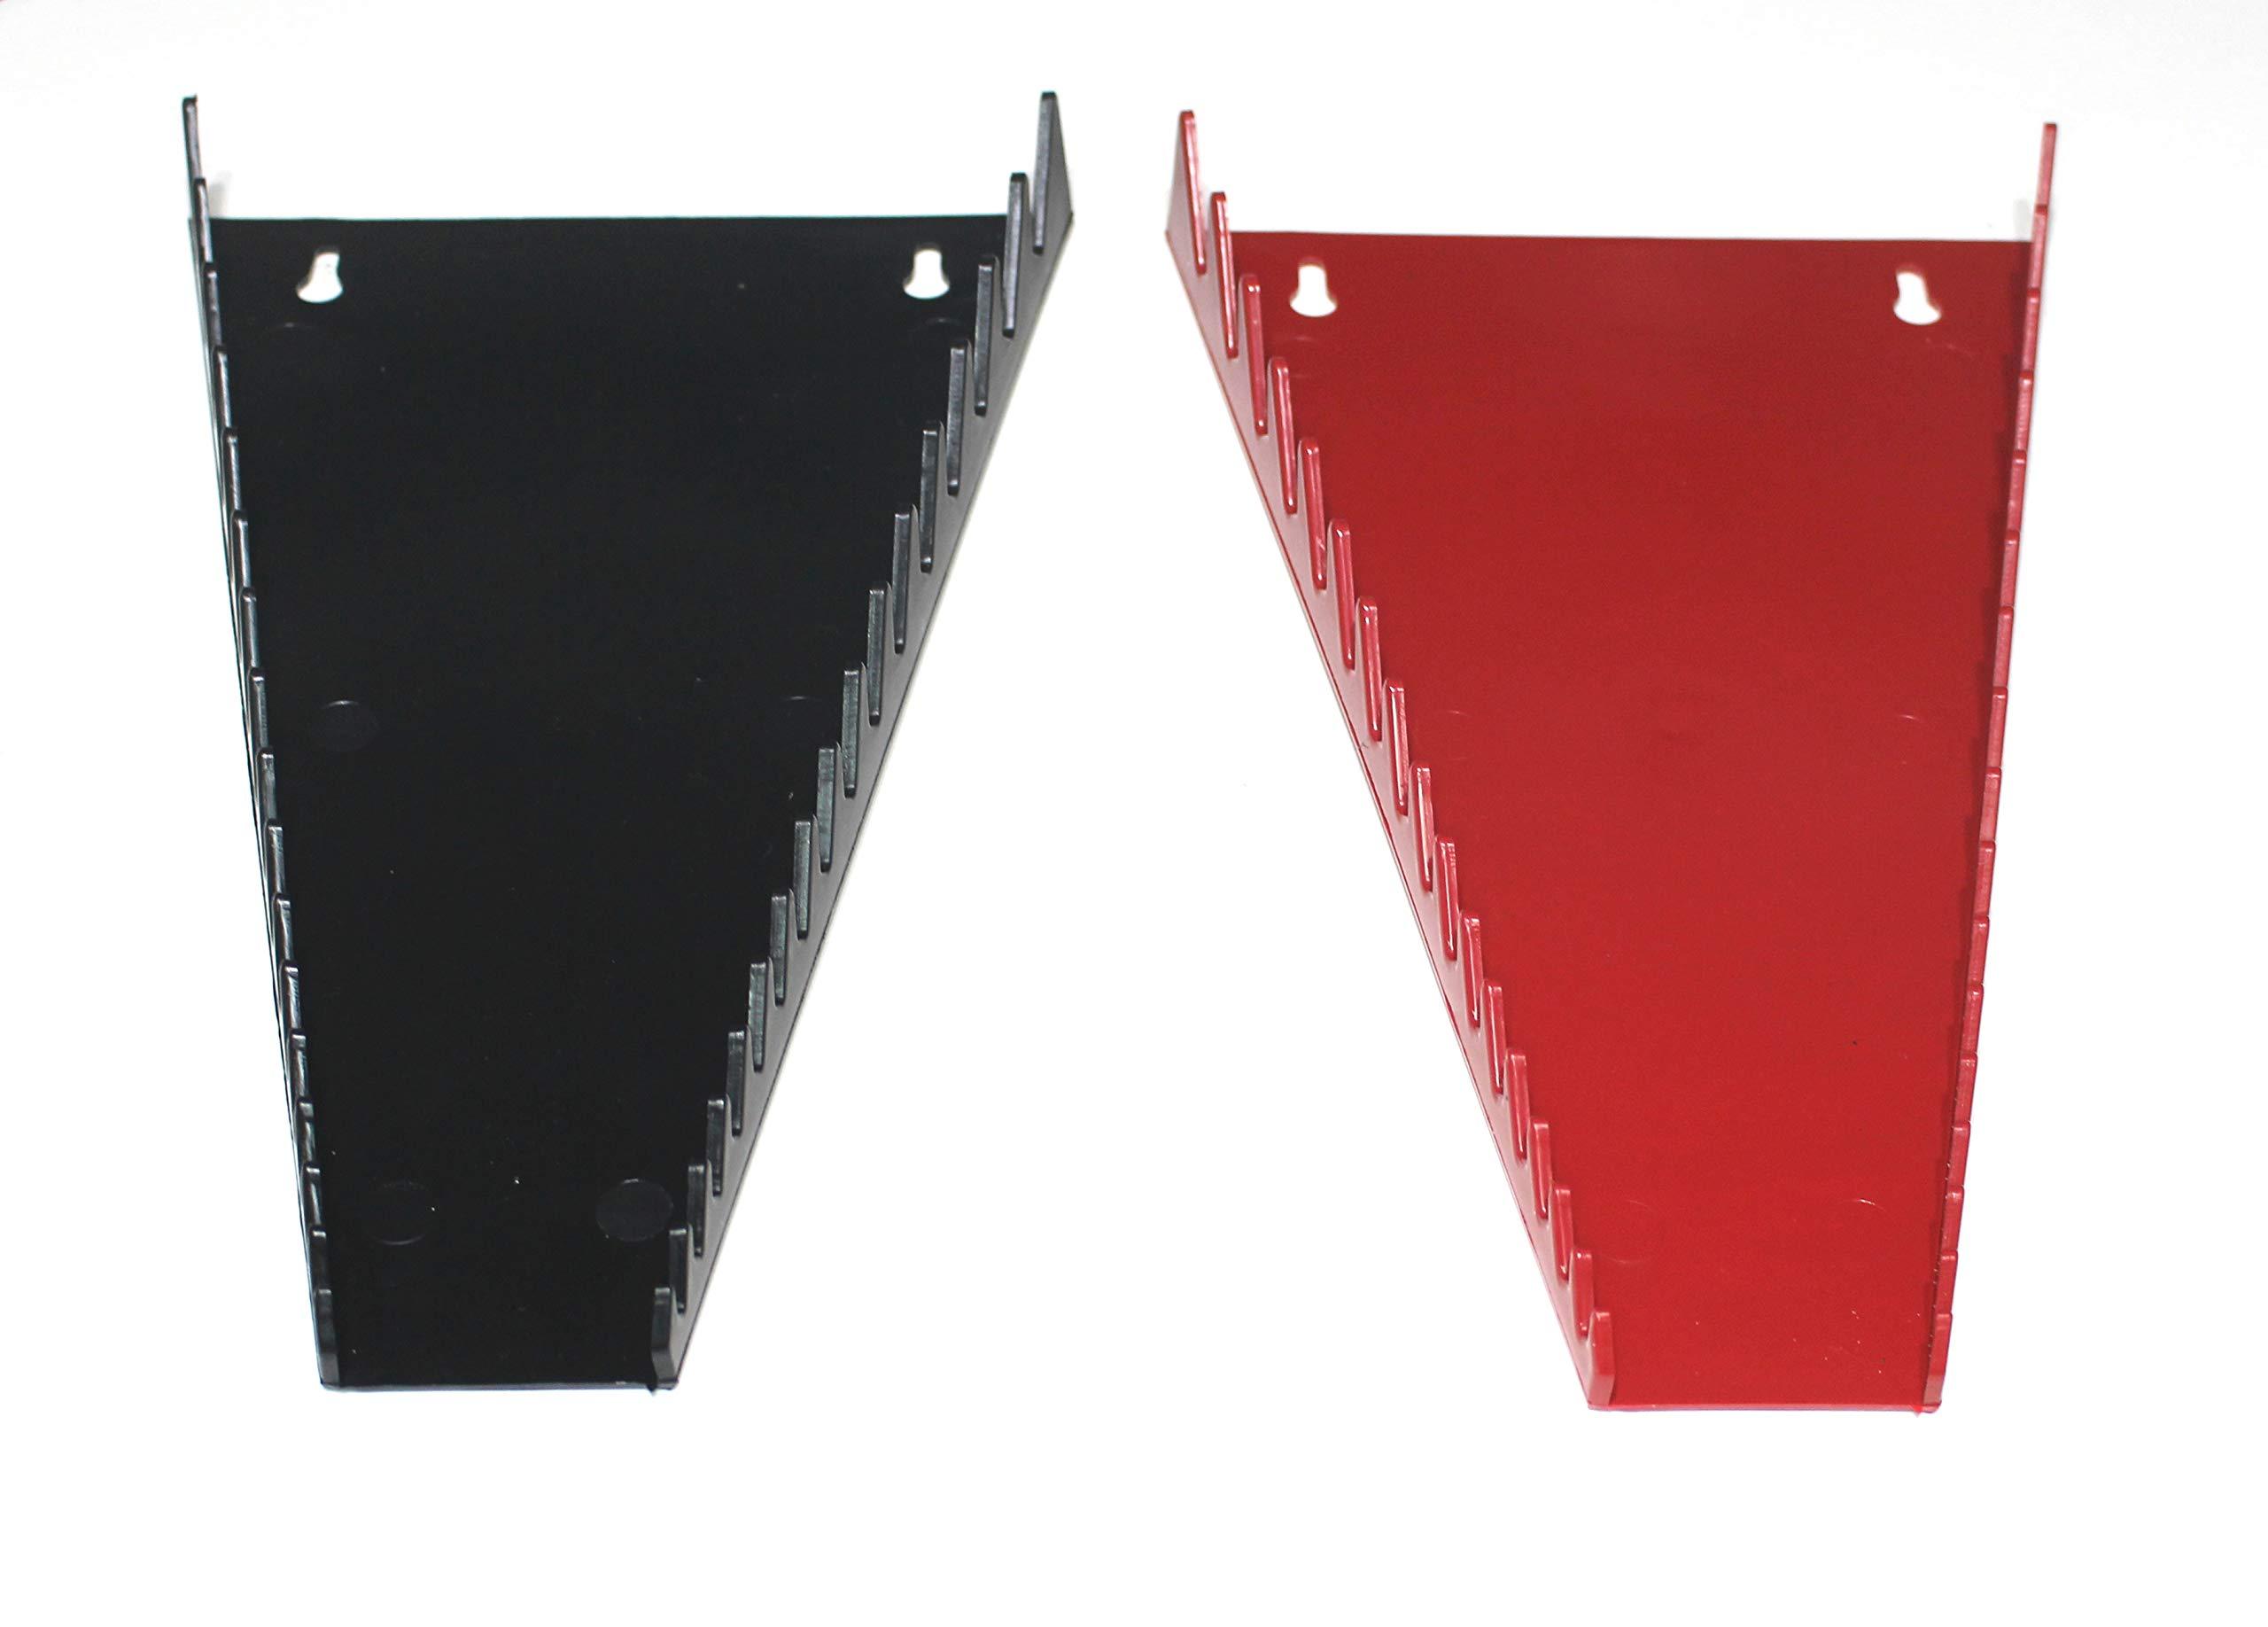 JSP Manufacturing Red & Black 16 Tool Standard Wrench Holder Wrench Organizer 2 Pack | Storage Rack Tray Tool Holder by JSP Manufacturing